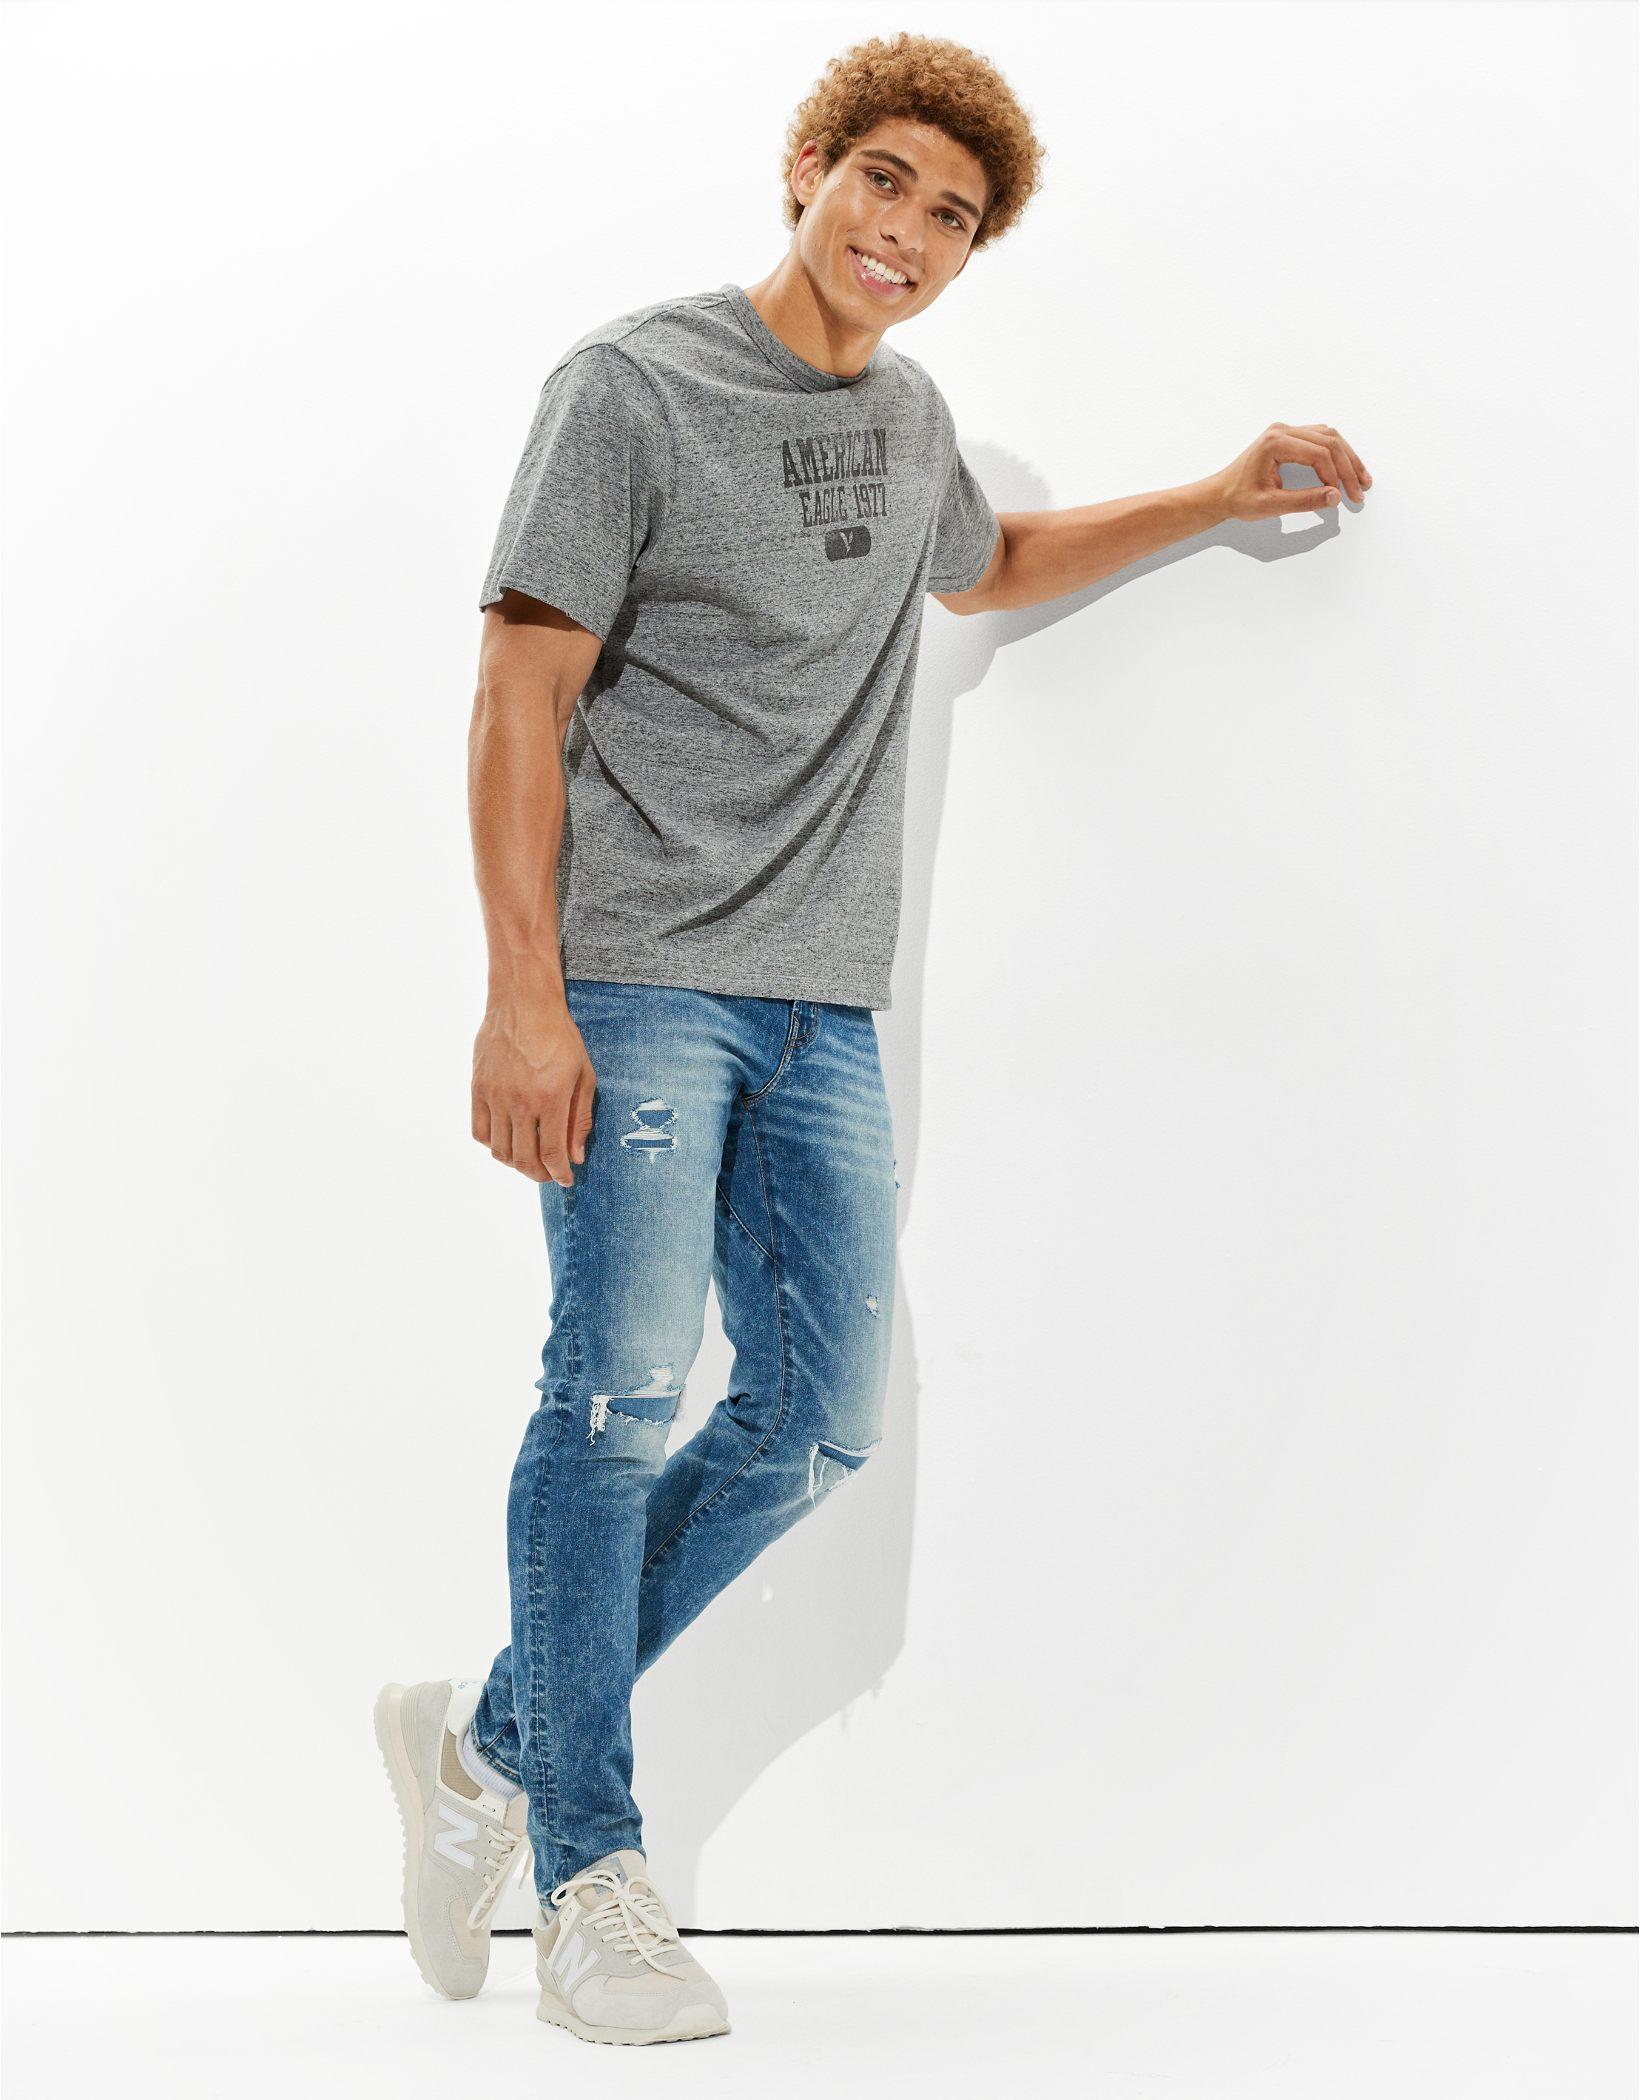 AE AirFlex 360 Move-Free Ripped Athletic Skinny Jean